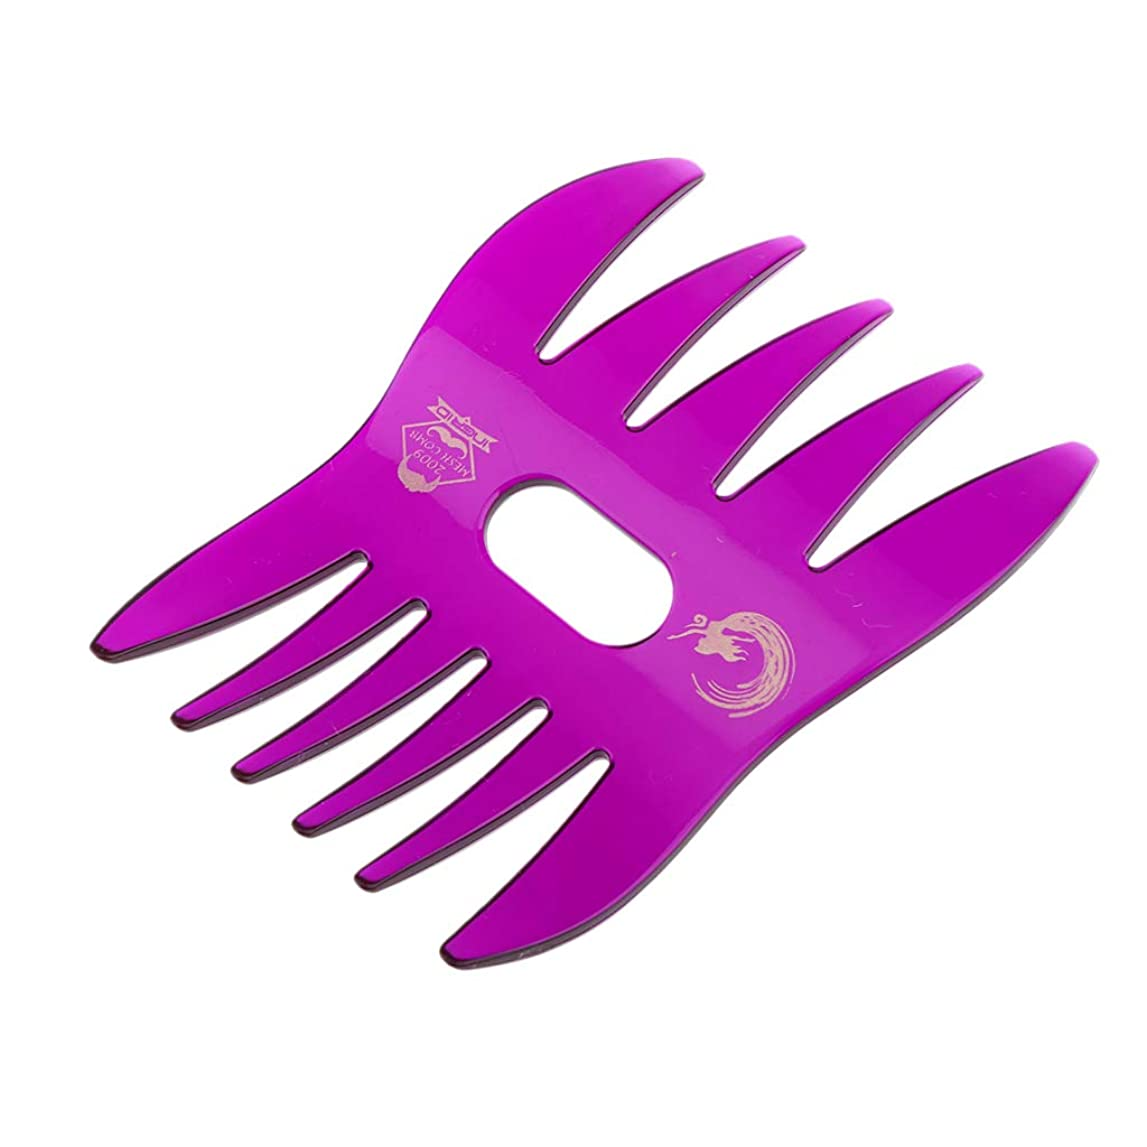 T TOOYFUL デュアルサイドメンズオイルヘアコンサロン 帯電防止髪 くし 口ひげ - 紫